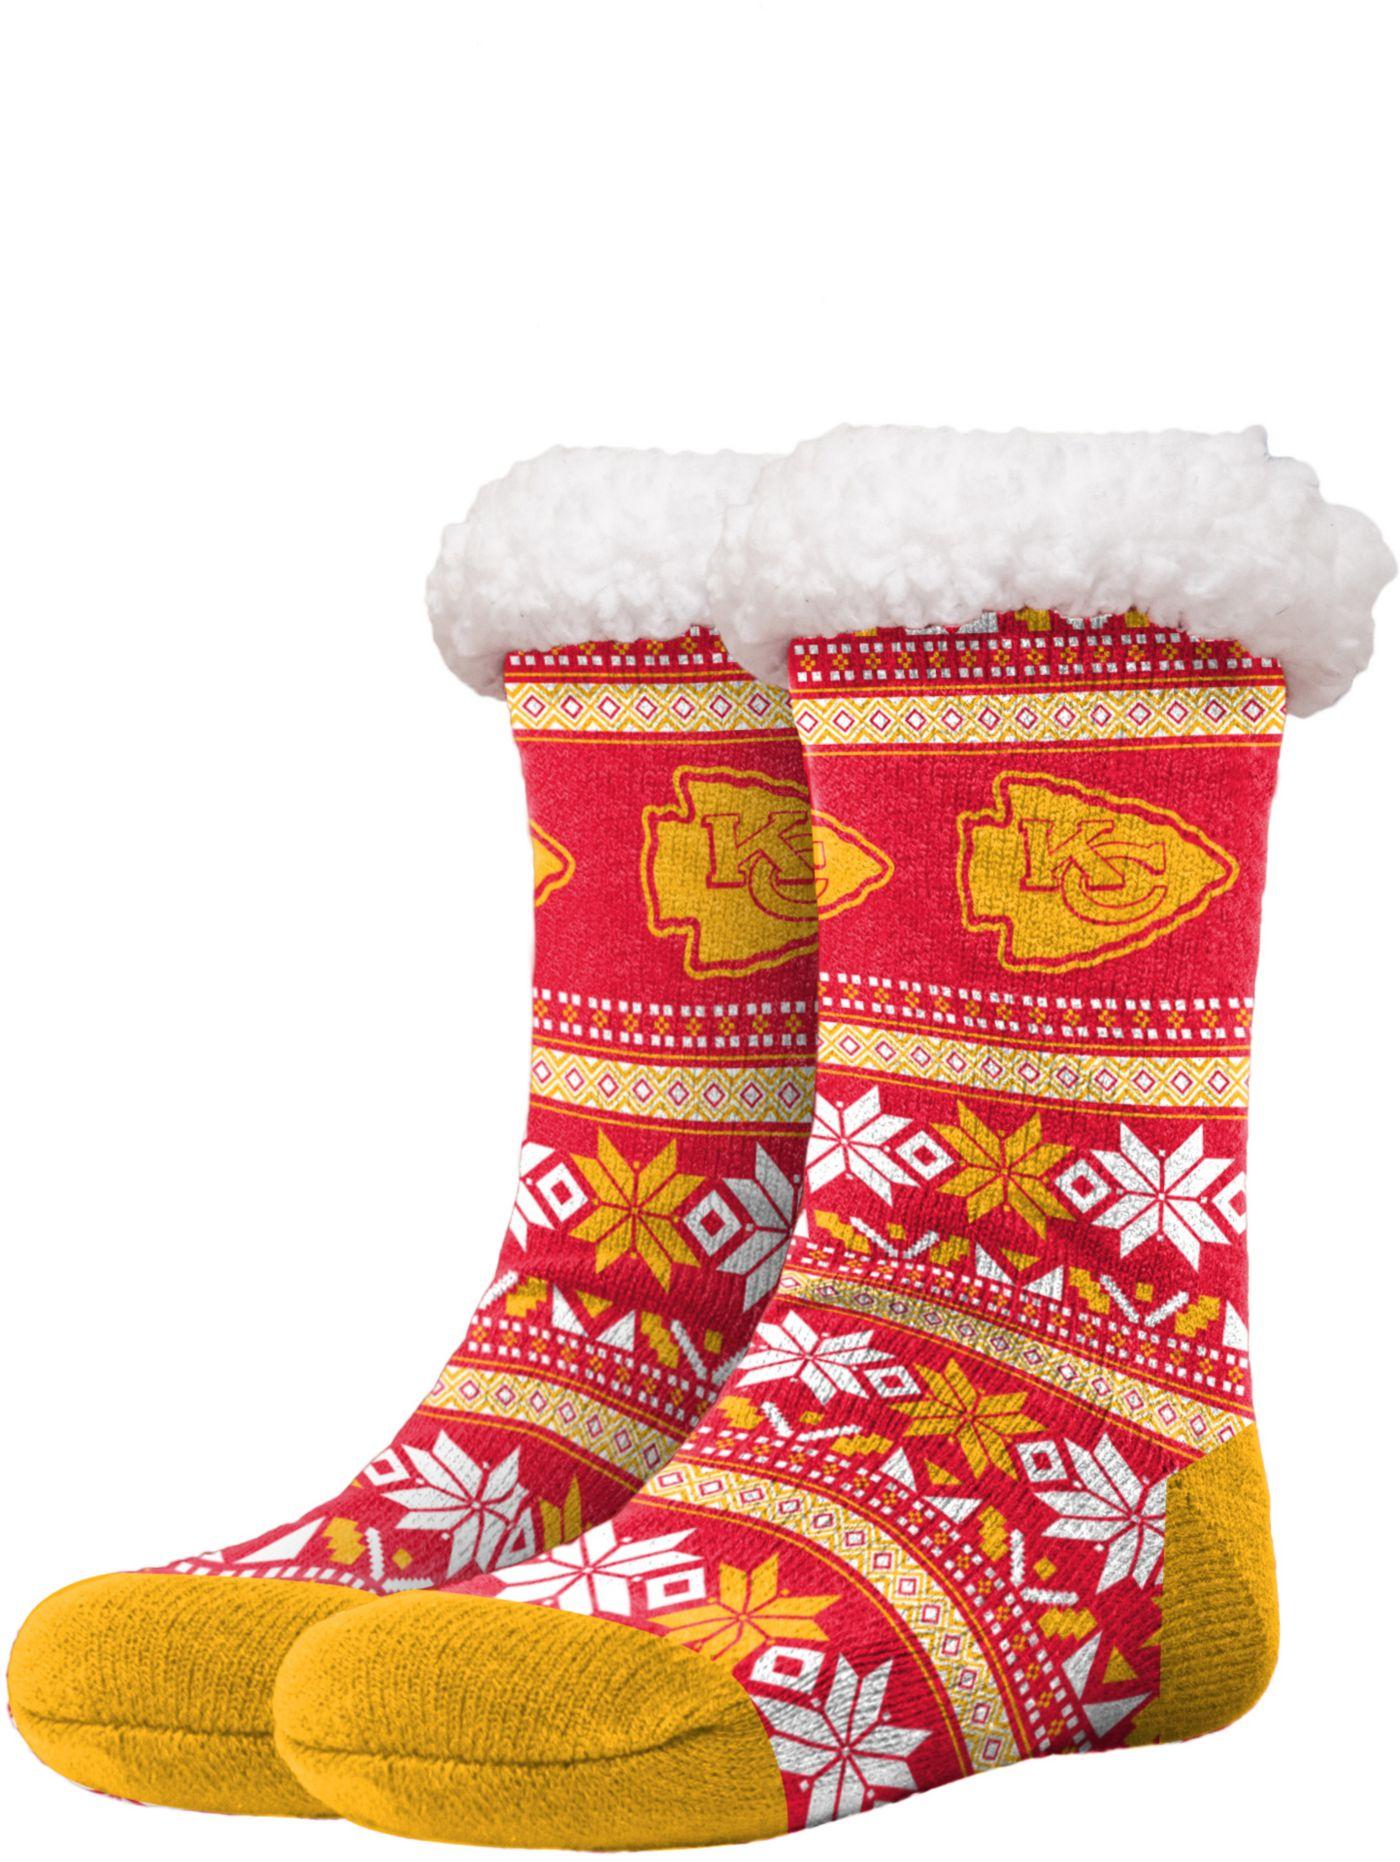 FOCO Kansas City Chiefs Footy Slippers